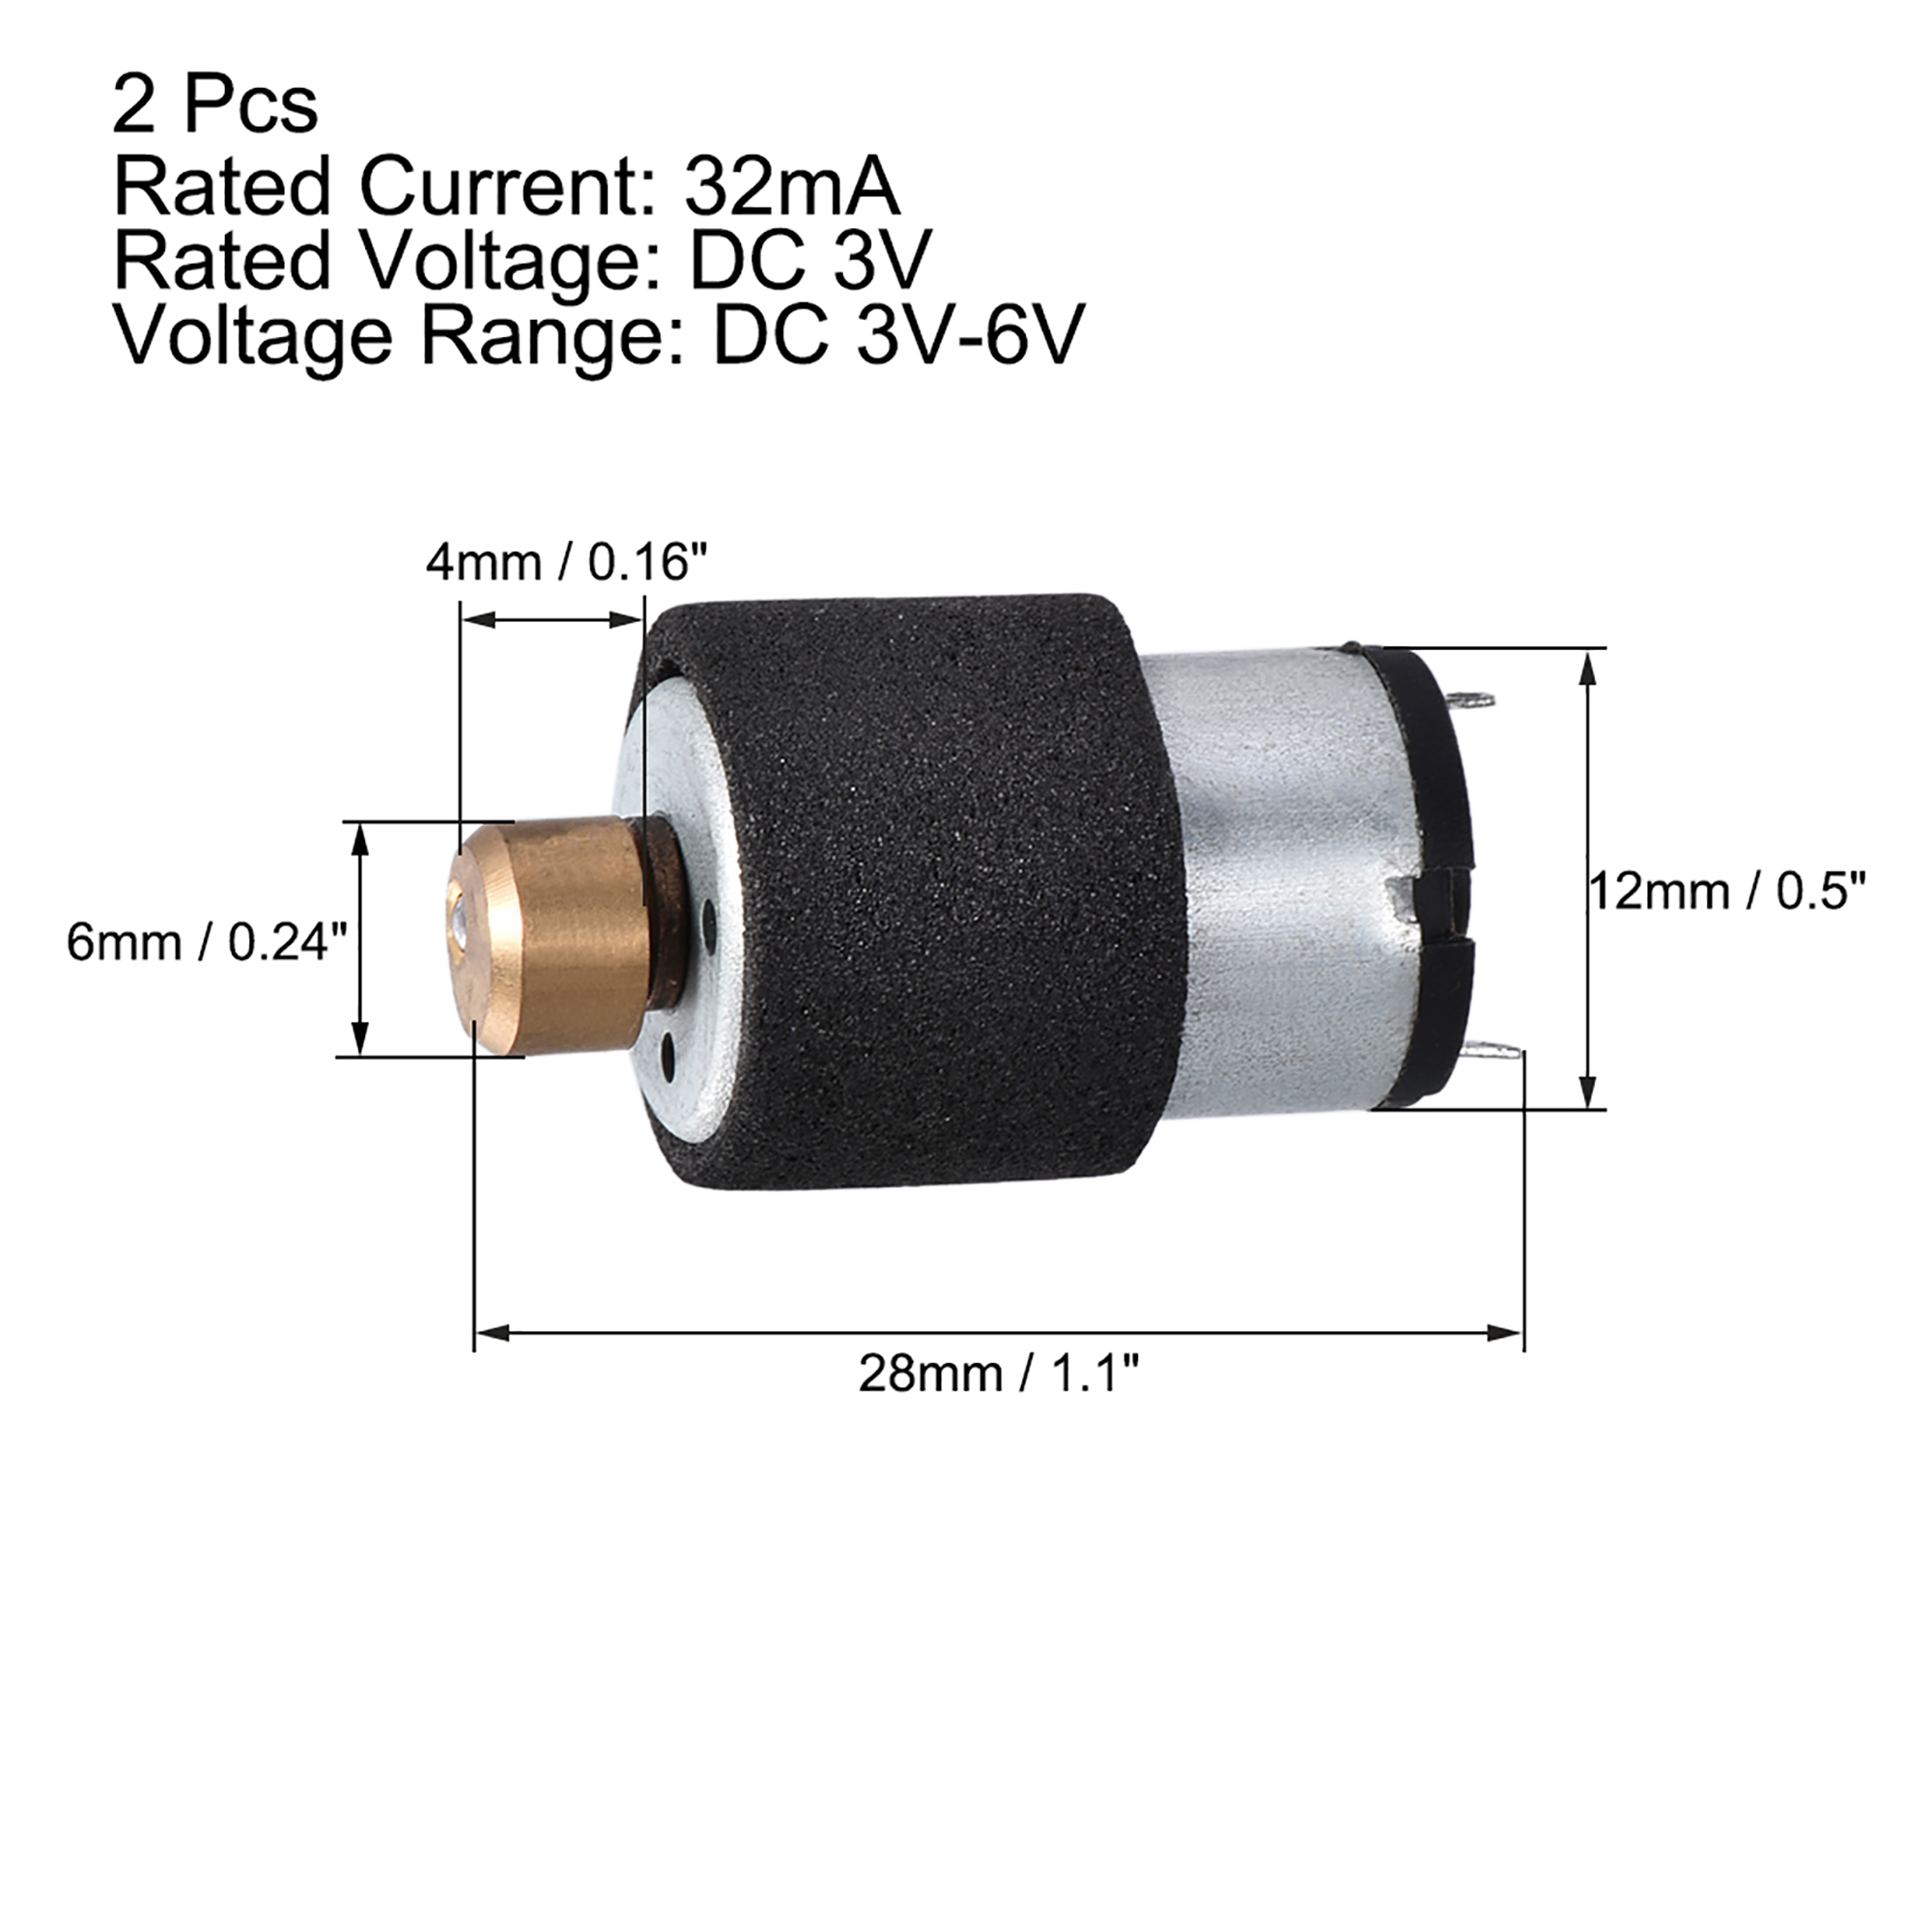 sourcing map Micro Mini Vibraci/ón Motores Fuerte Alimentaci/ón DC 3V-6V 32mA 28x12mm El/éctrico Motor 5uds